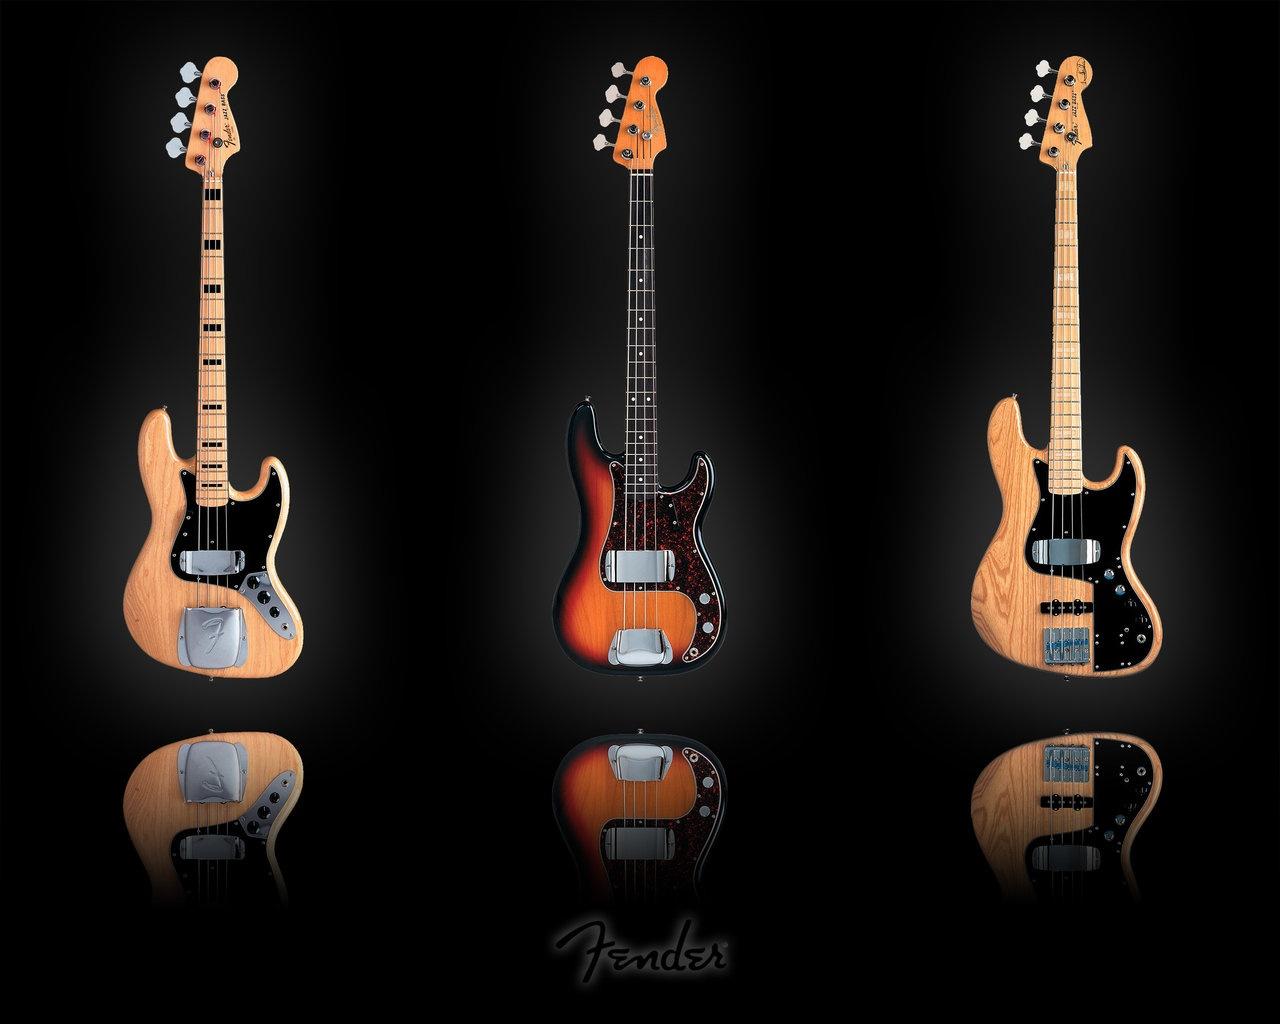 1280x1024 Fender Bass Guitar desktop wallpapers and stock photos 1280x1024